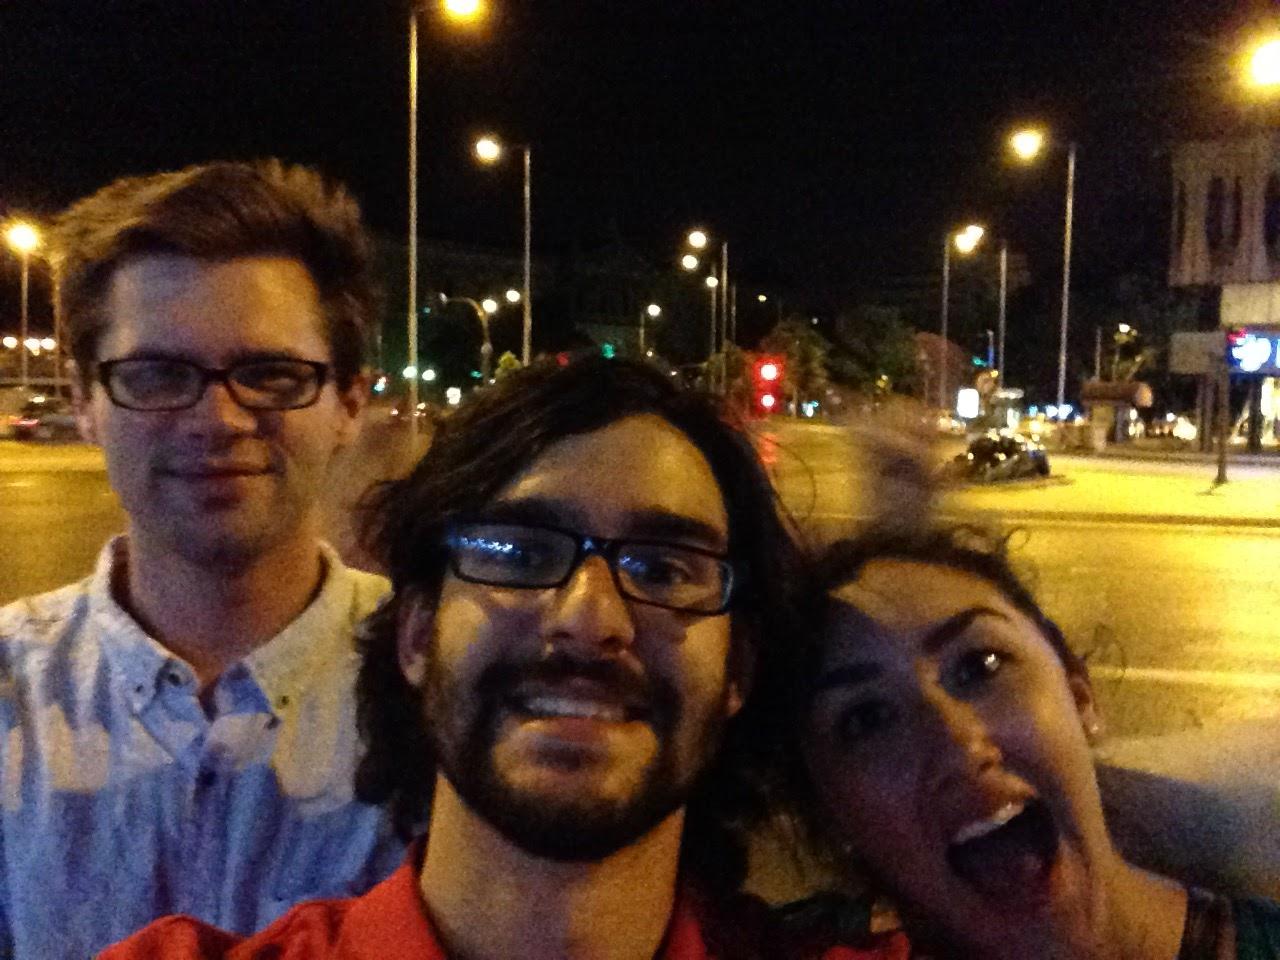 Photo: Evan, Gabby and Gabe (Haley Group) exploring Madrid